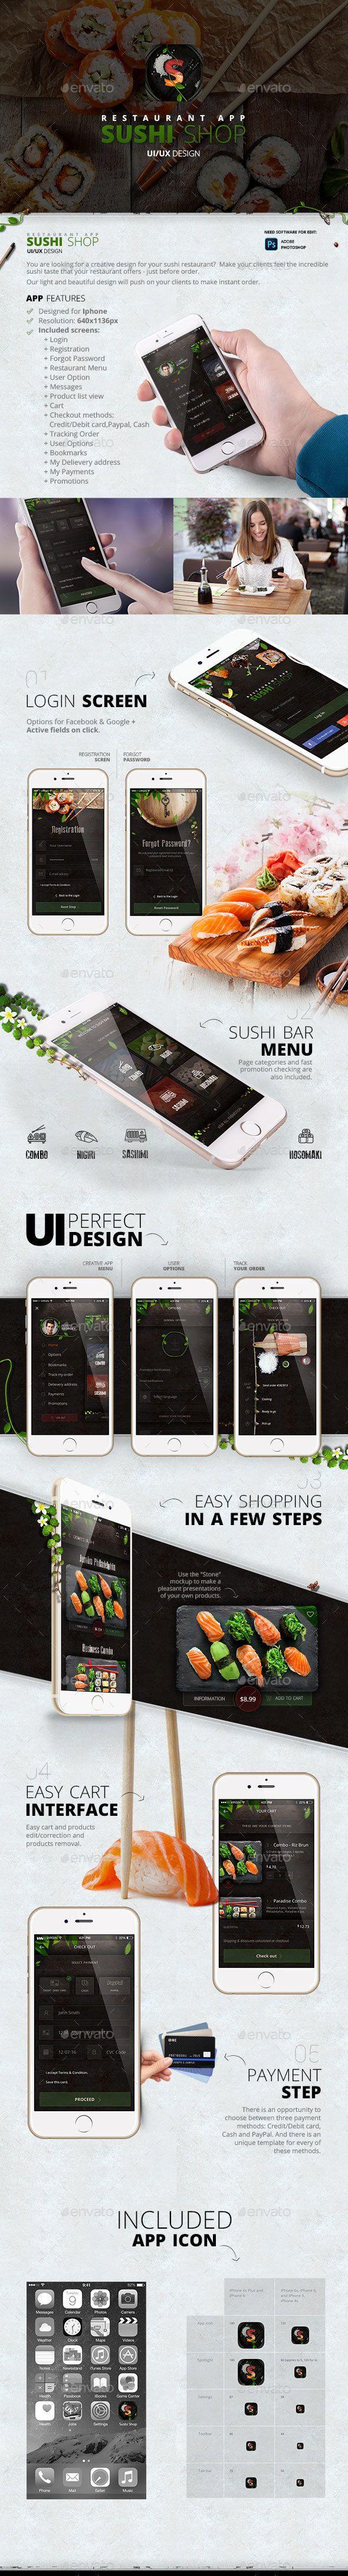 Sushi Shop Restaurant – App design (User Interfaces)